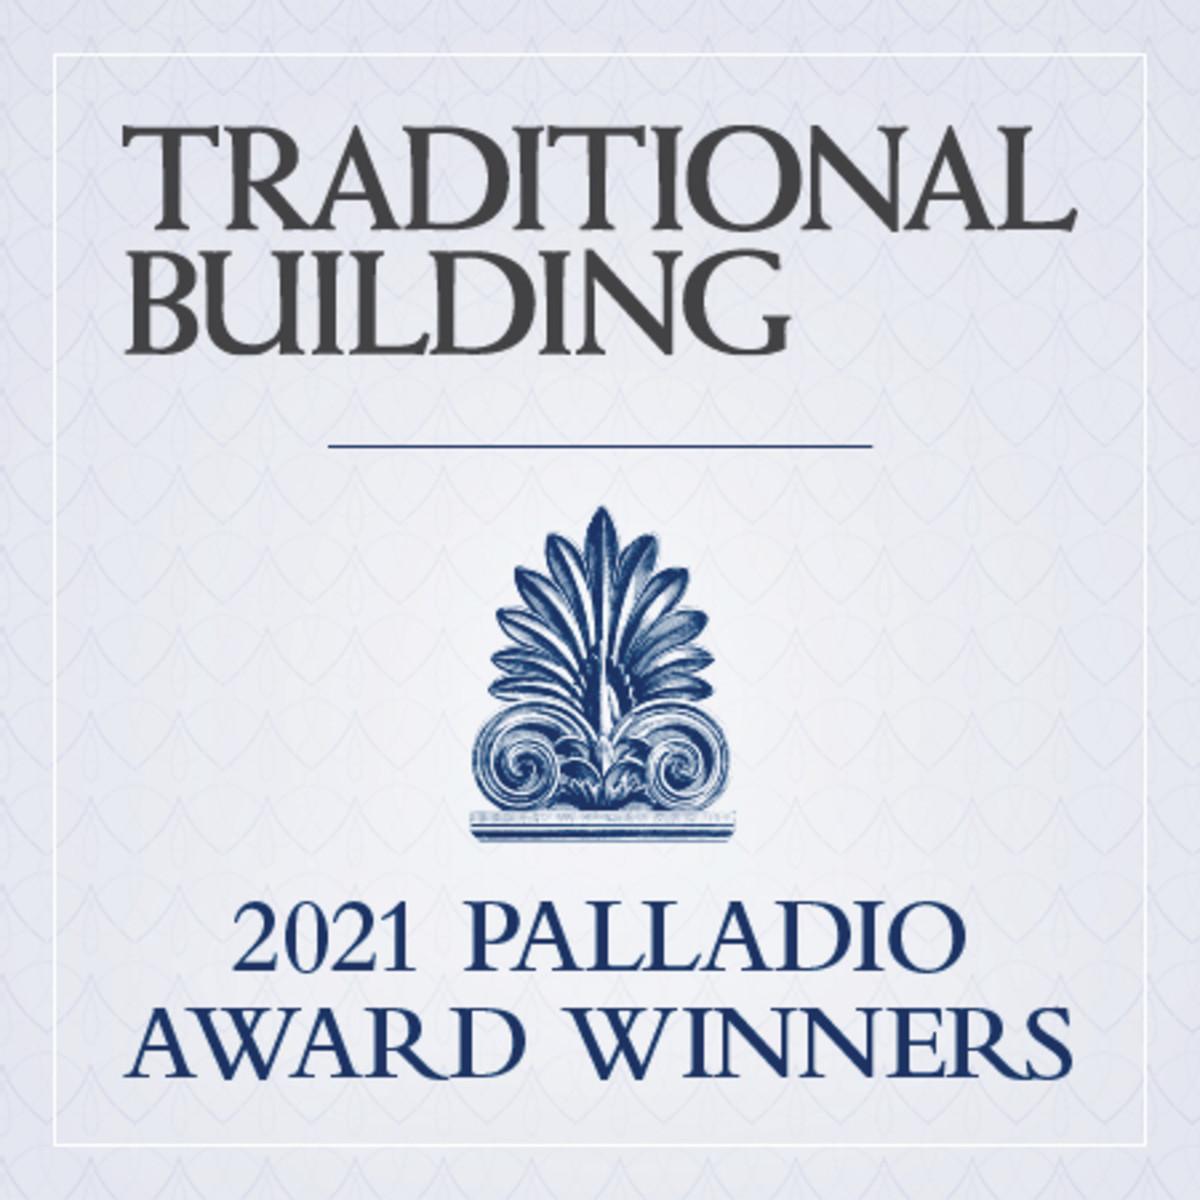 2021 Palladio Award Winners